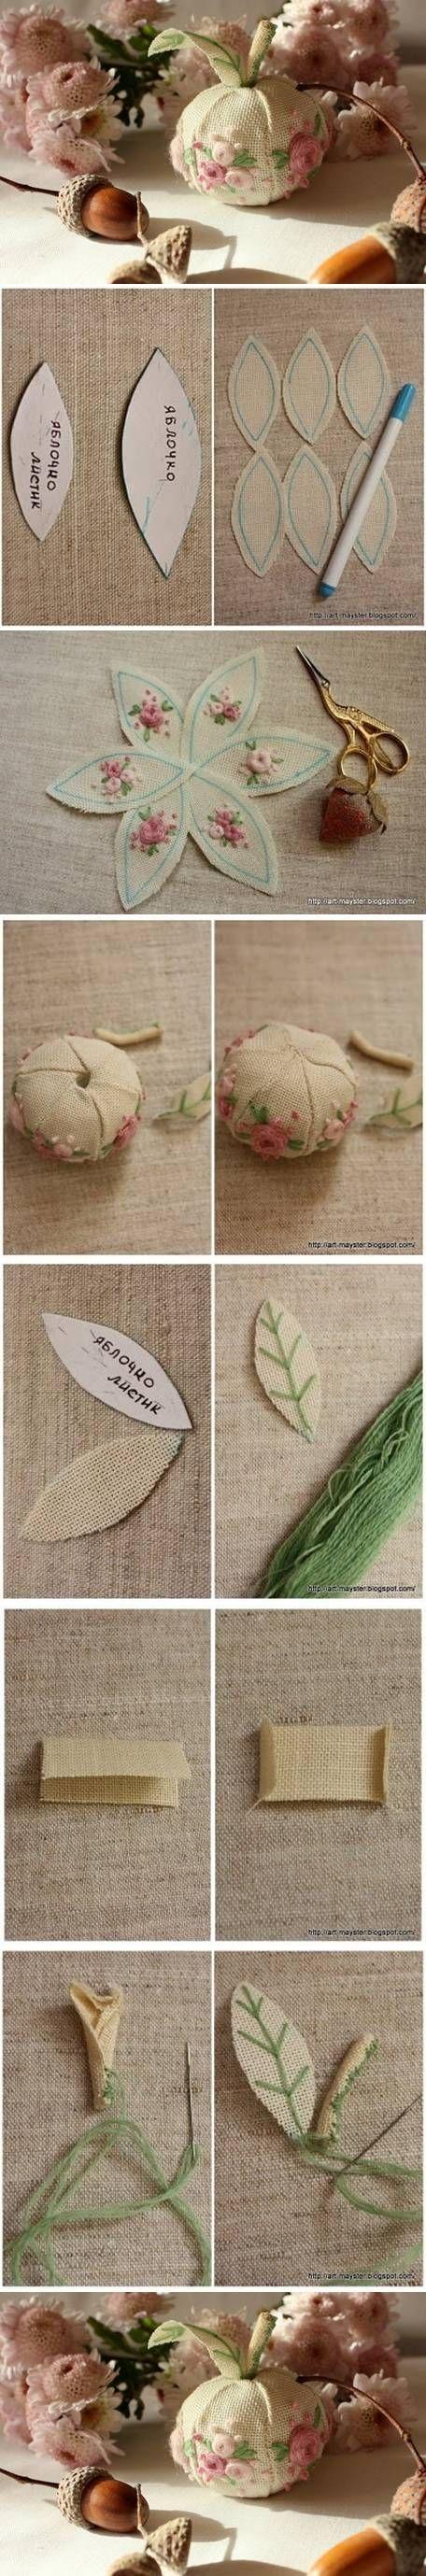 DIY Fabric Apple Decor: